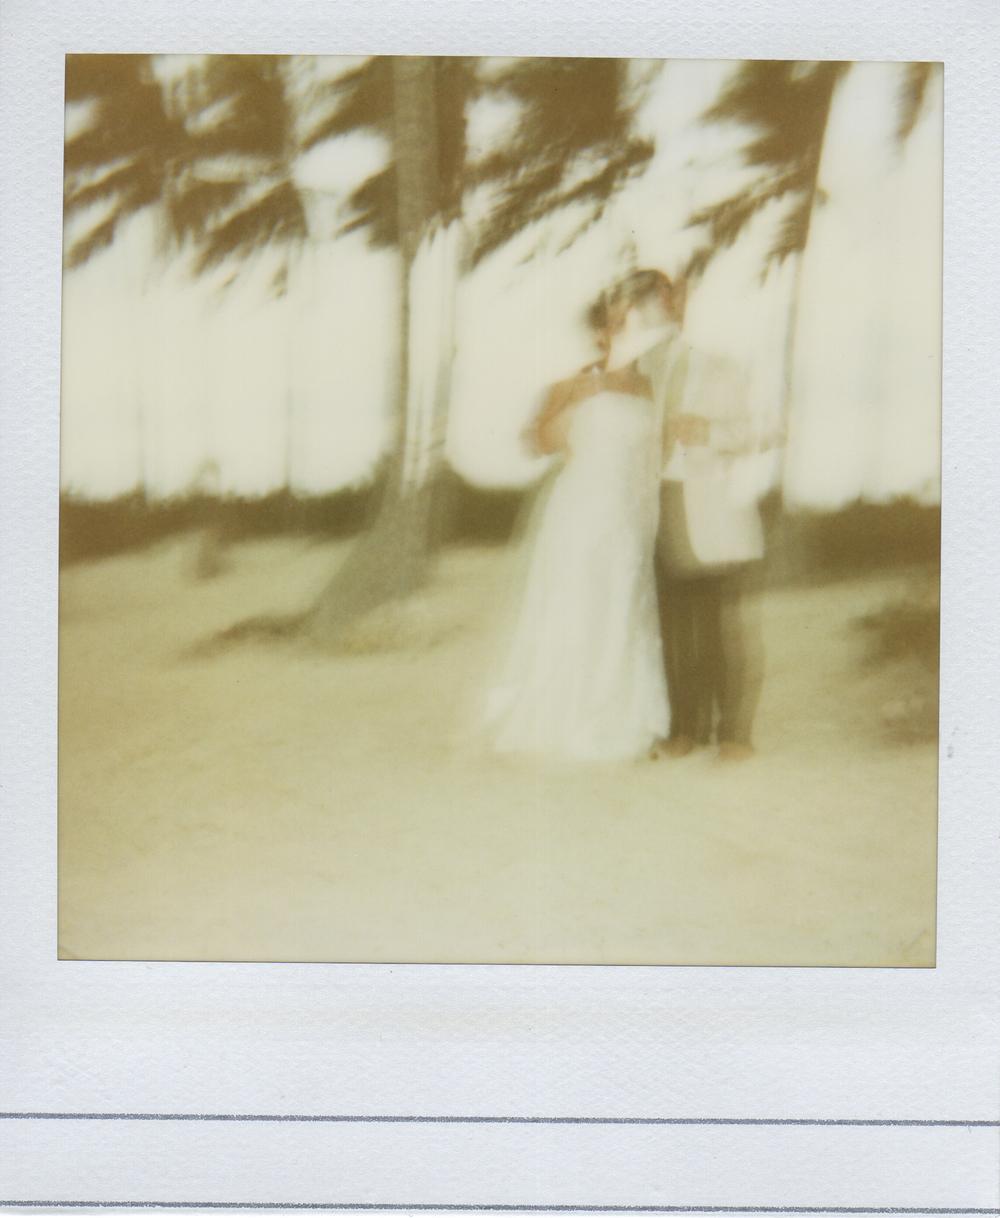 jlaurence-polaroid-167.jpg